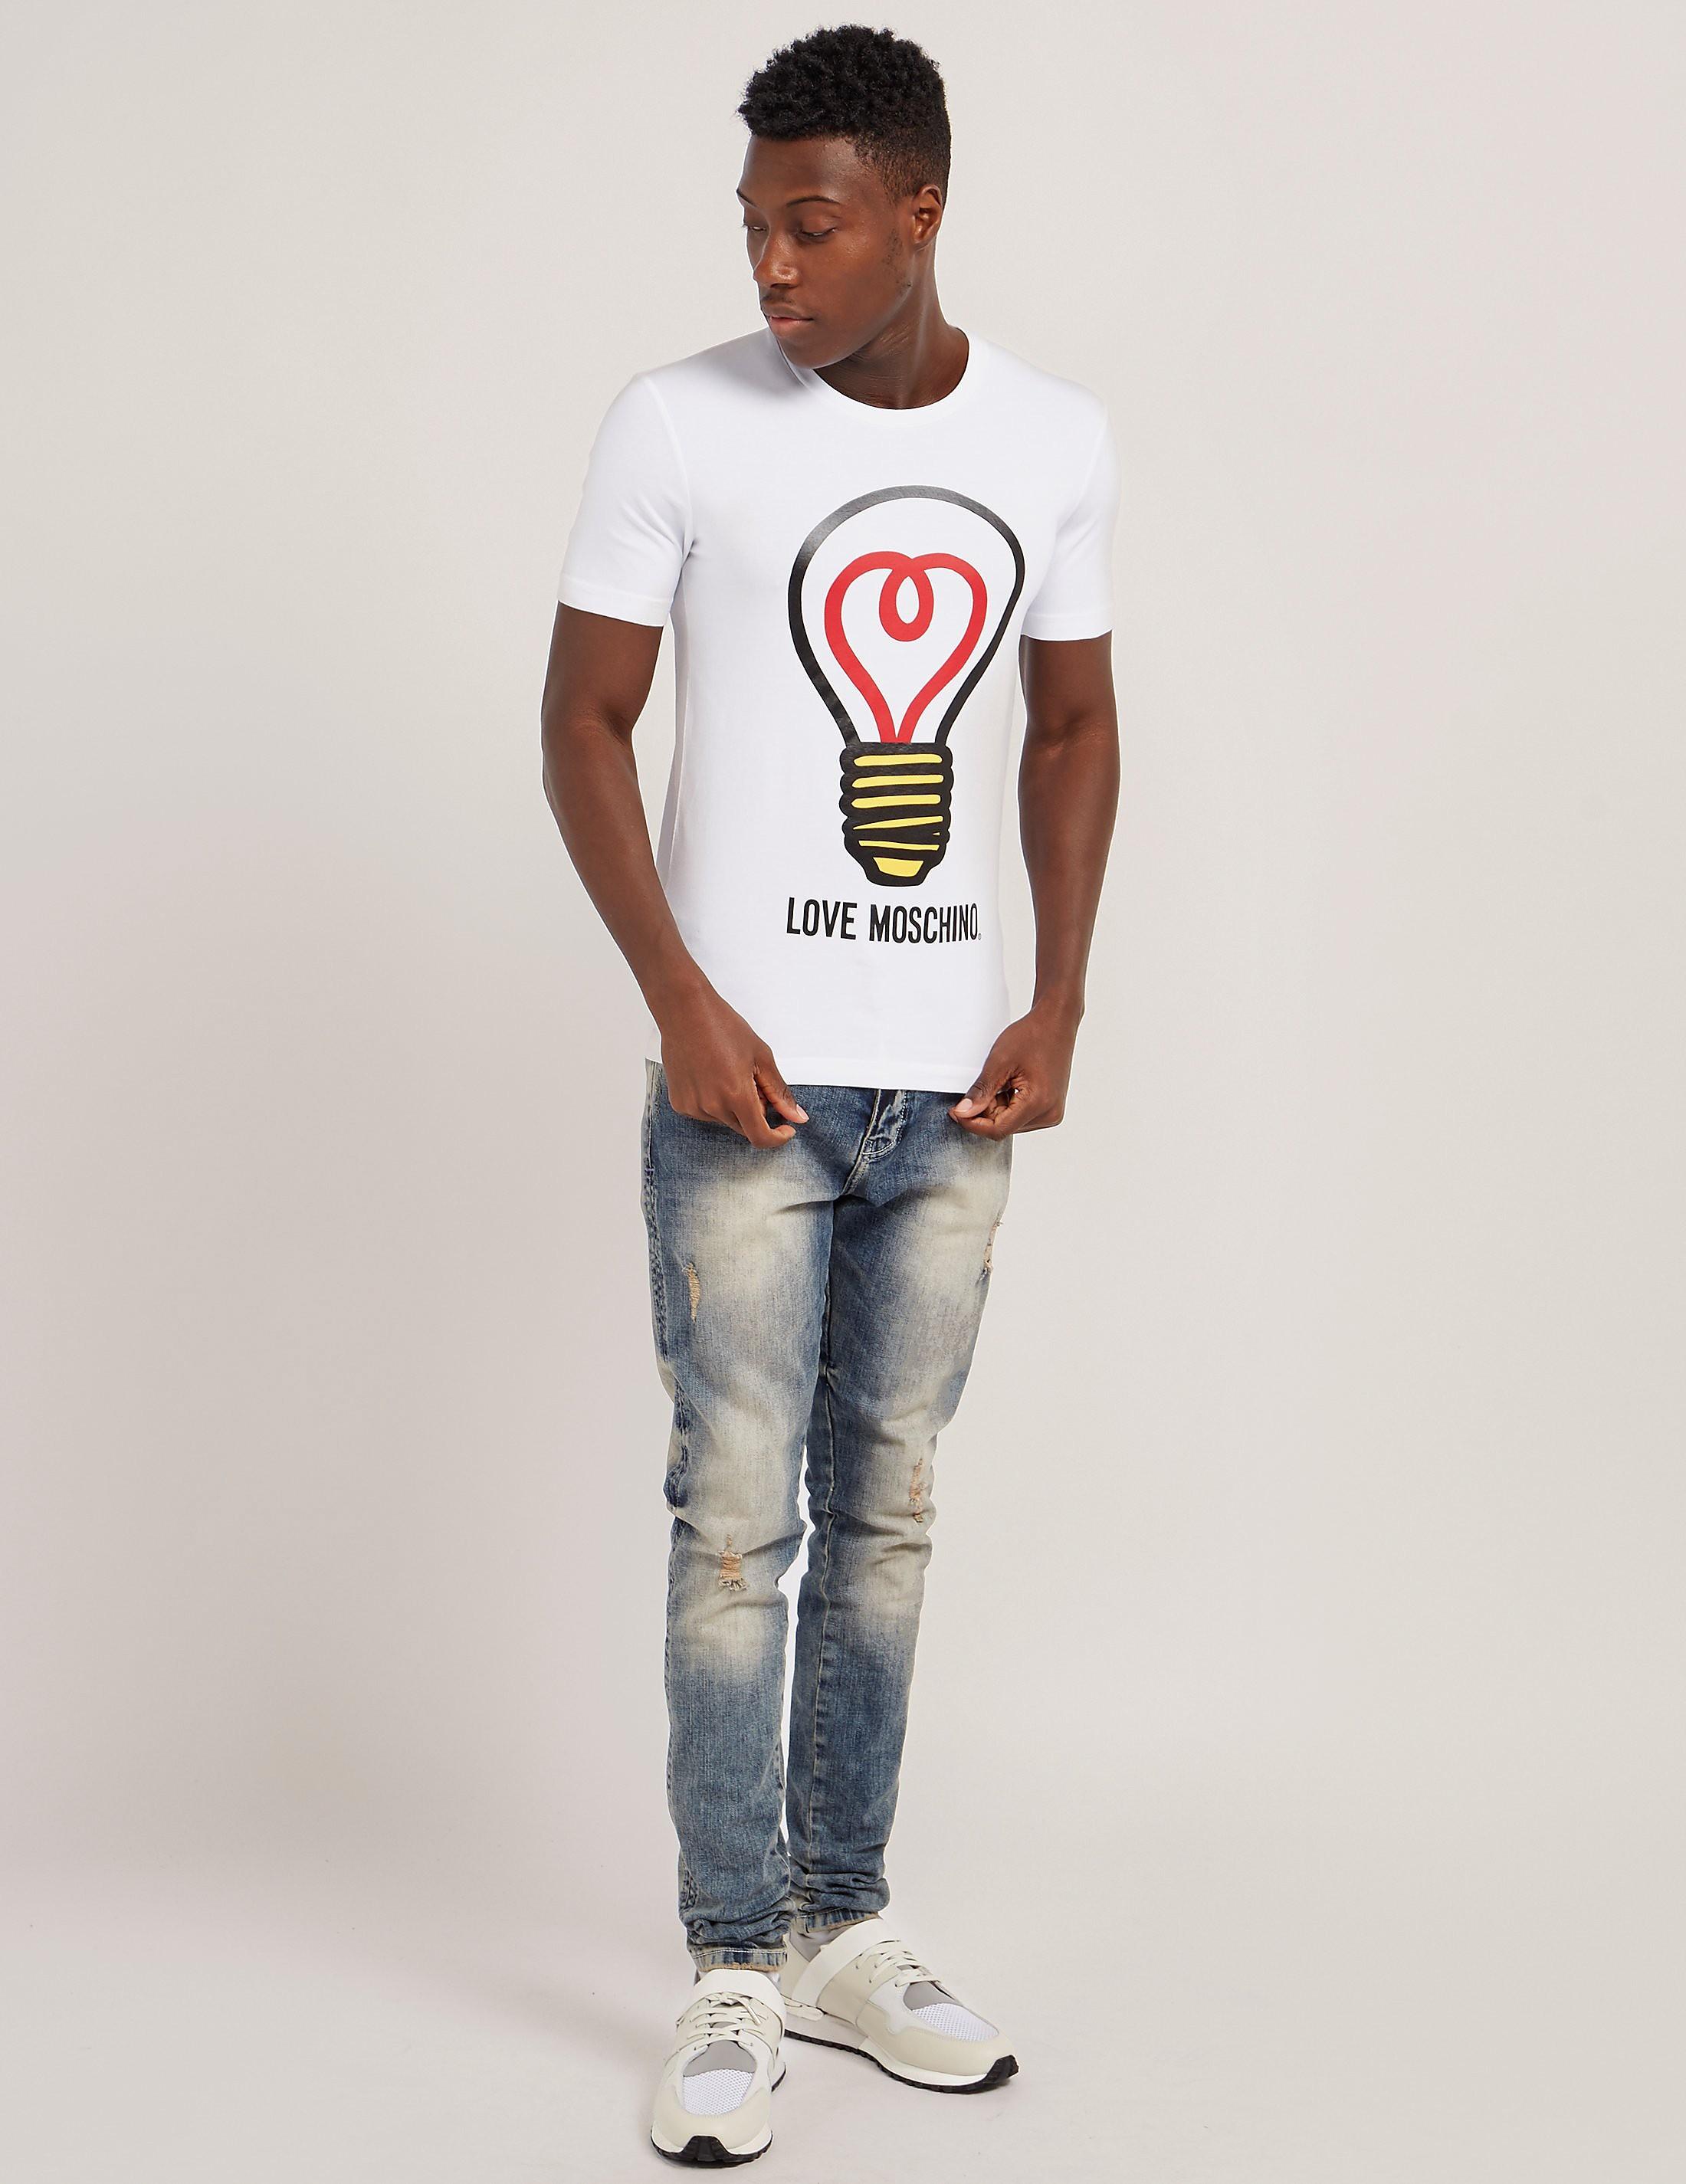 Love Moschino Light Bulb Print Short Sleeve T-Shirt